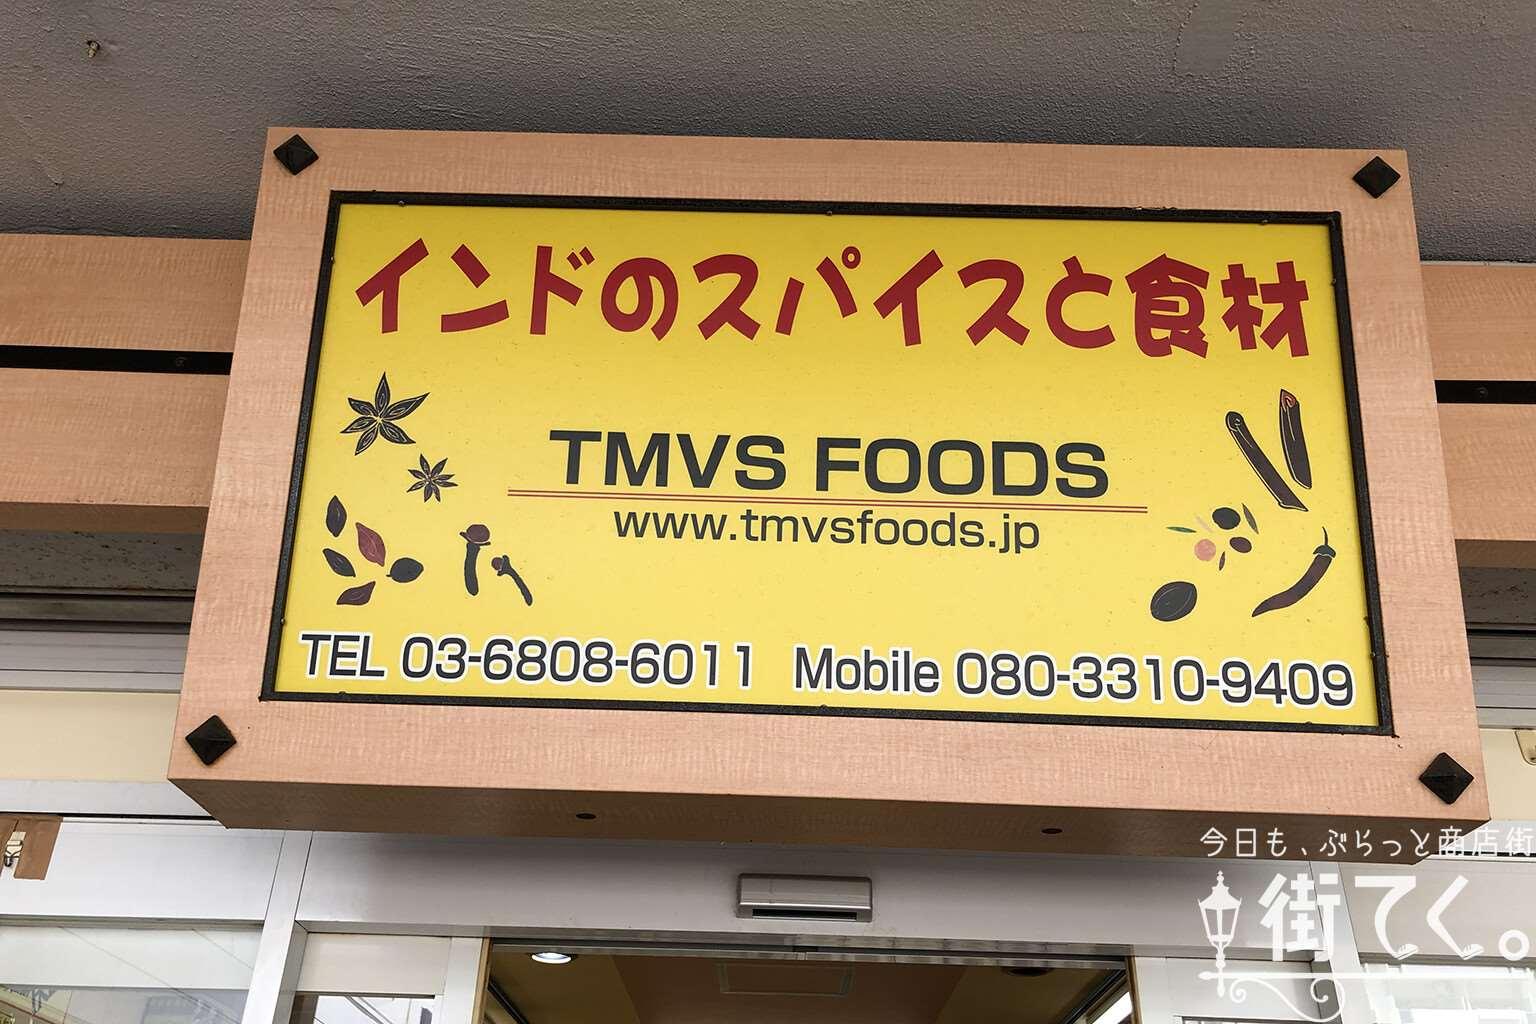 TMVS FOODS